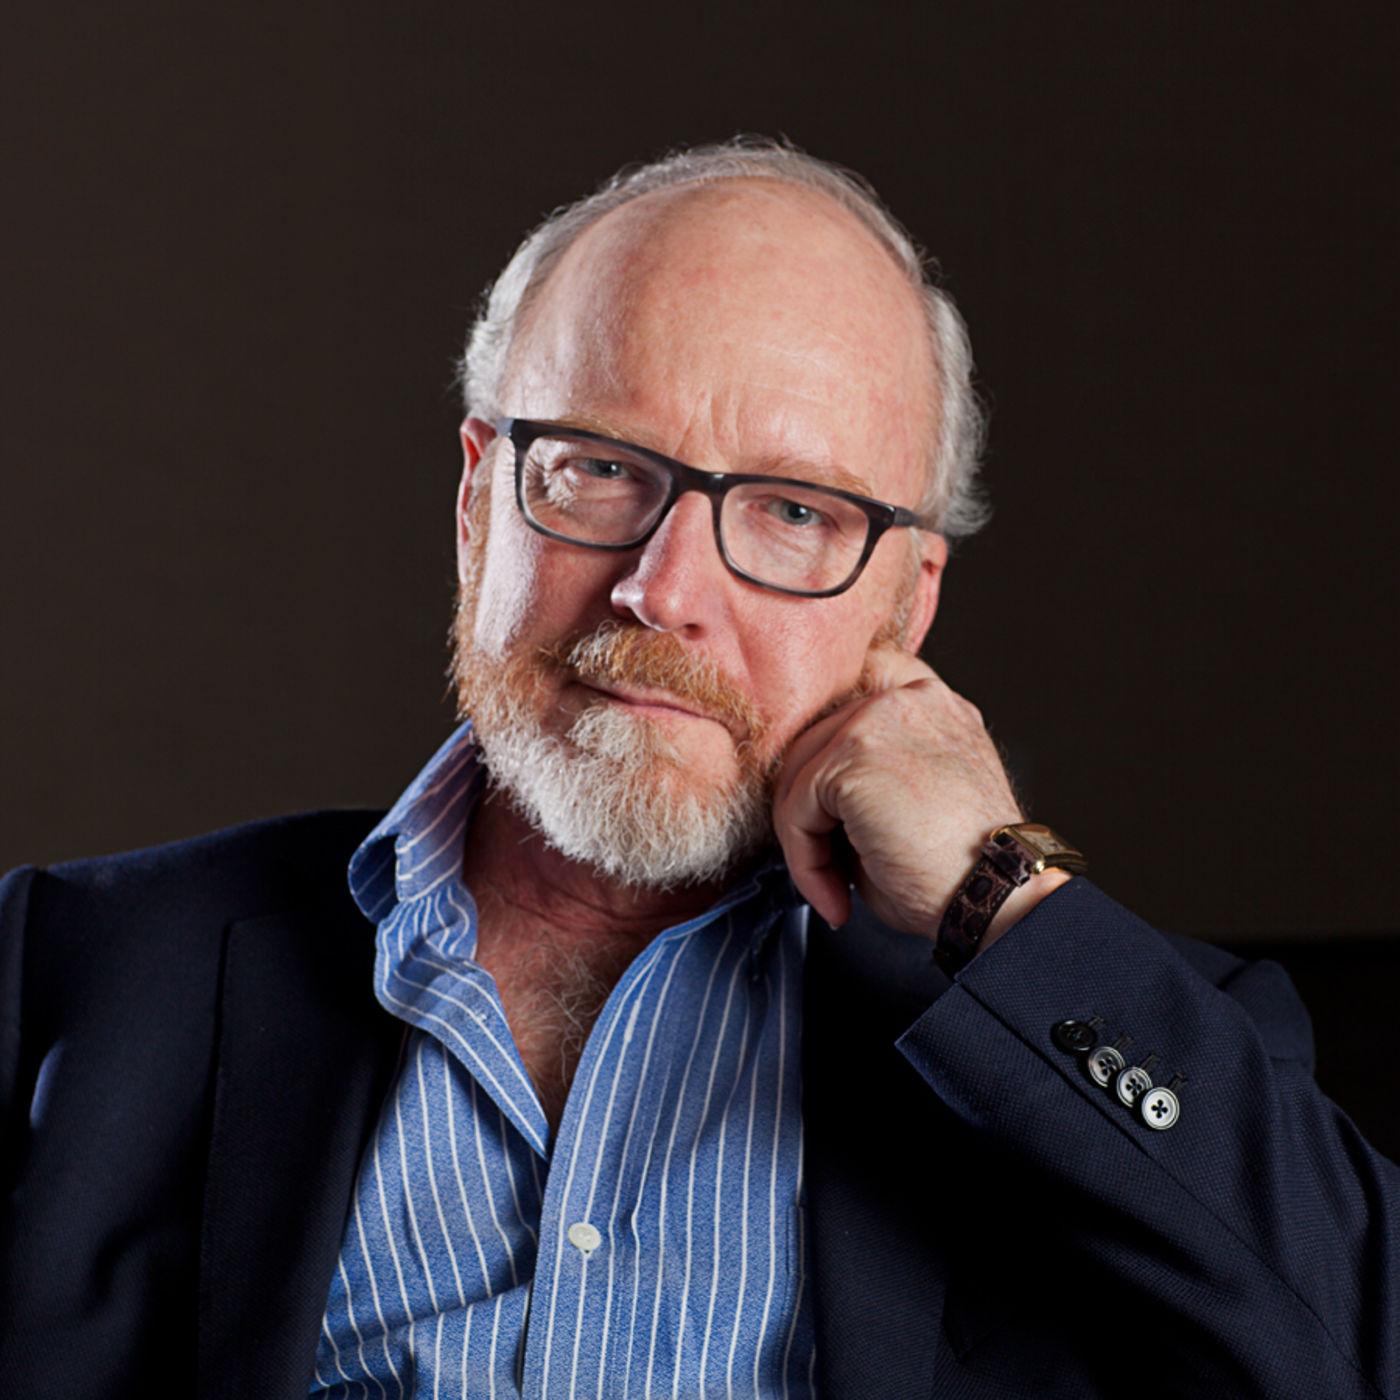 John Hagel: The Future of Work